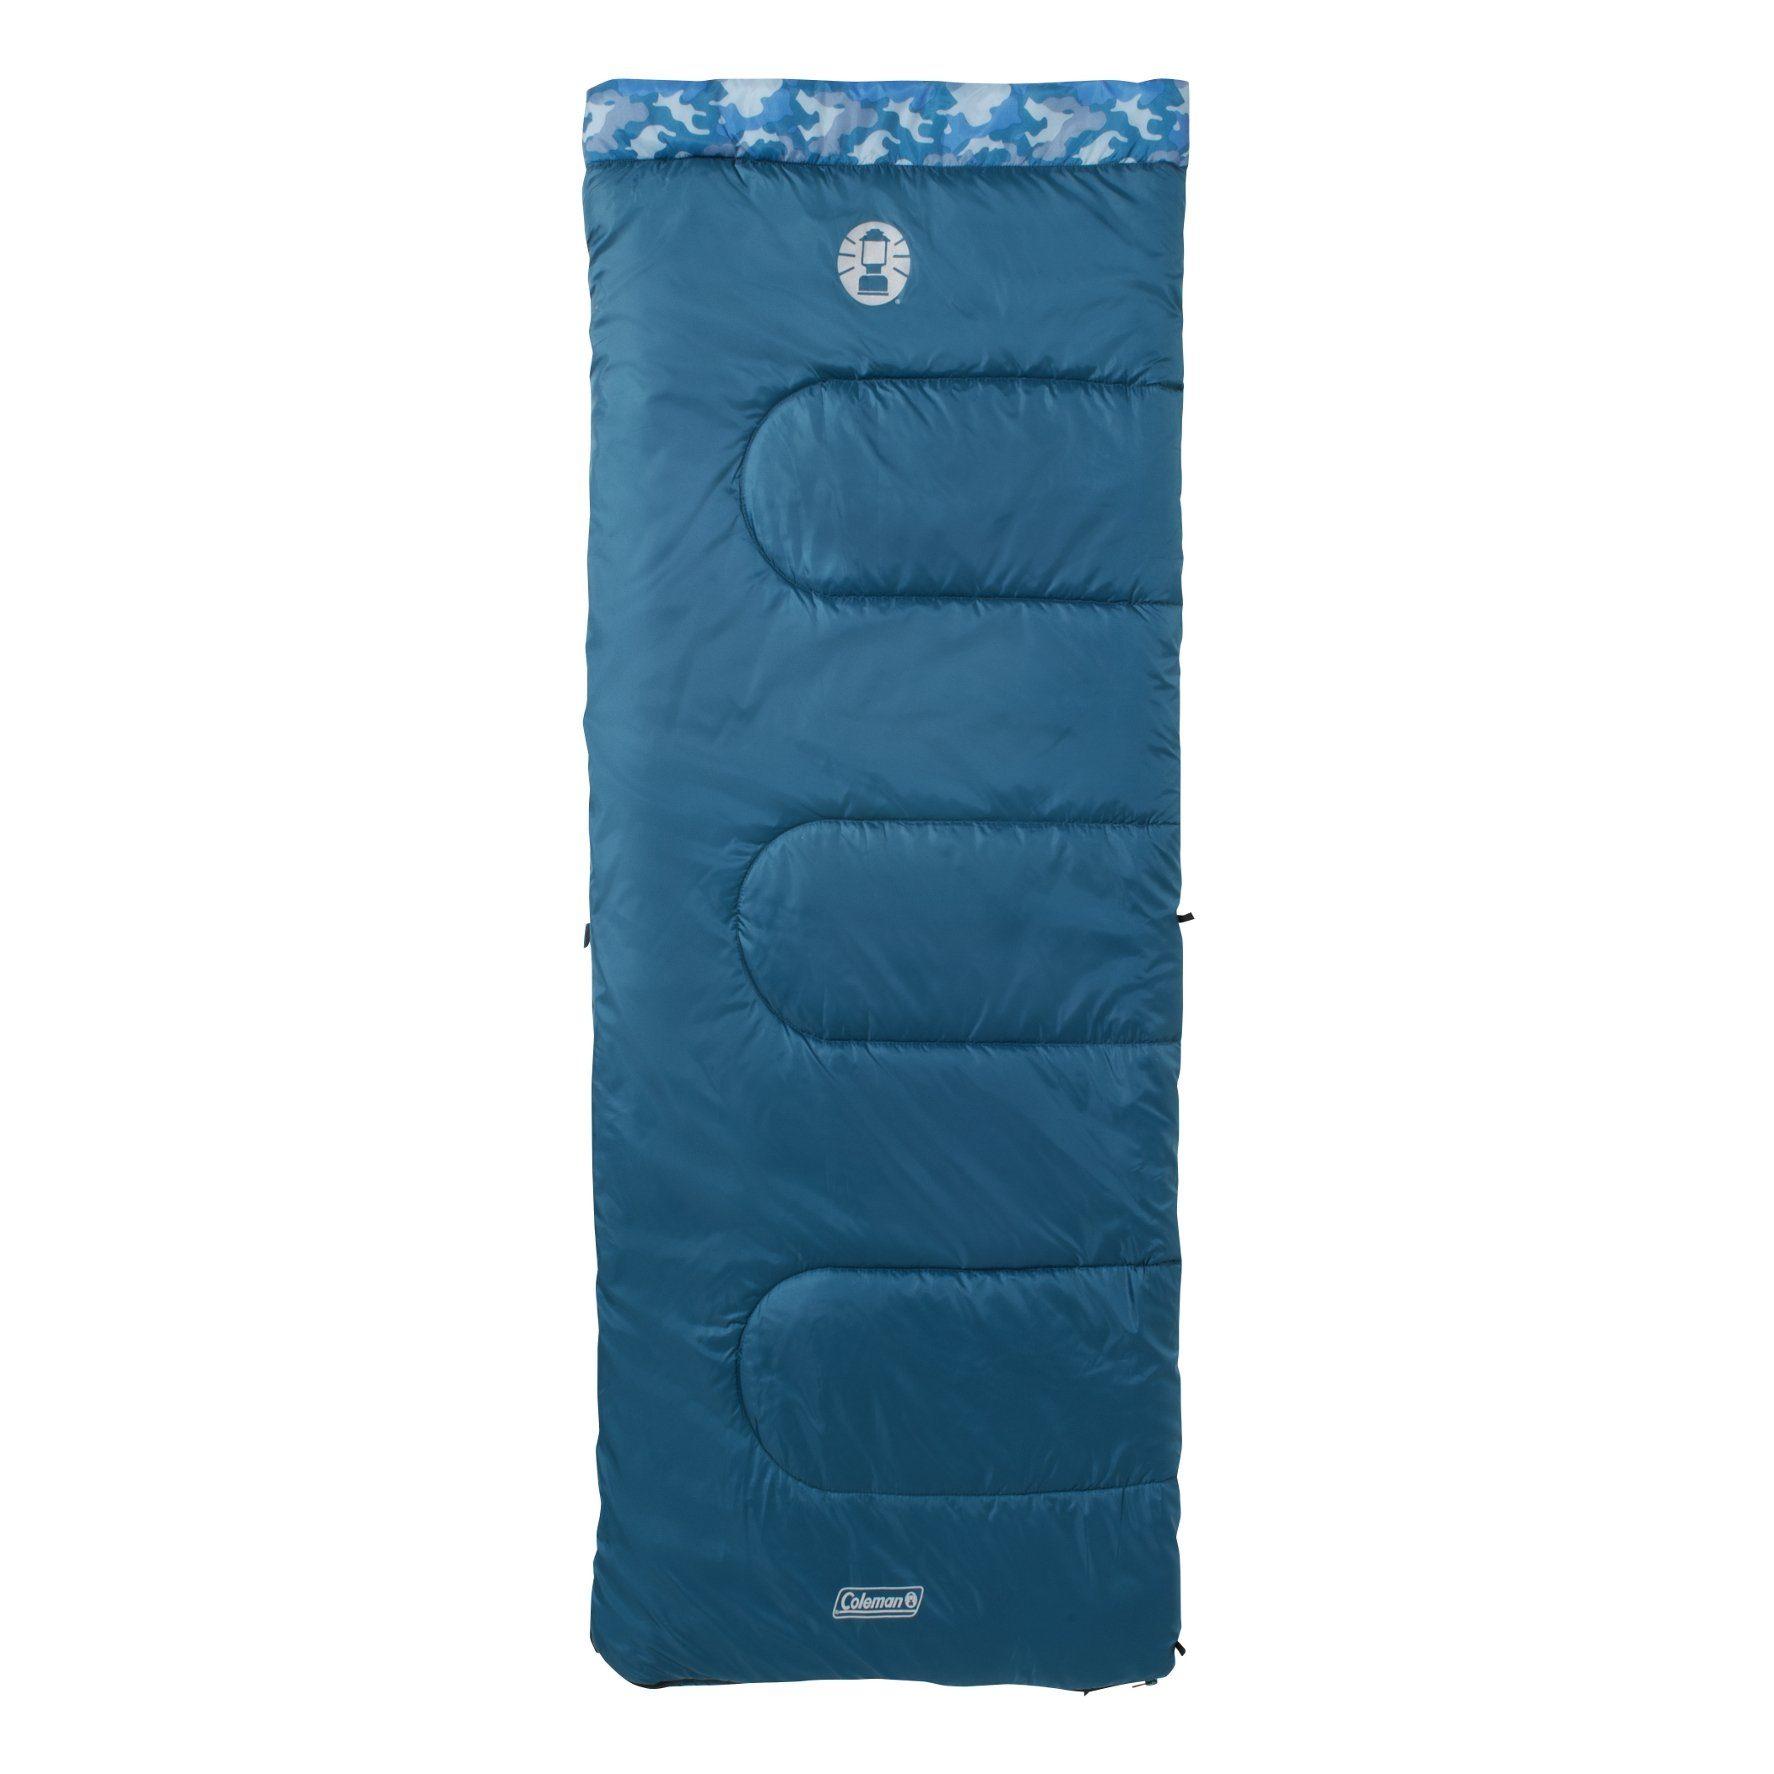 COLEMAN Schlafsack »Frisco Rectangular Sleeping Bag«